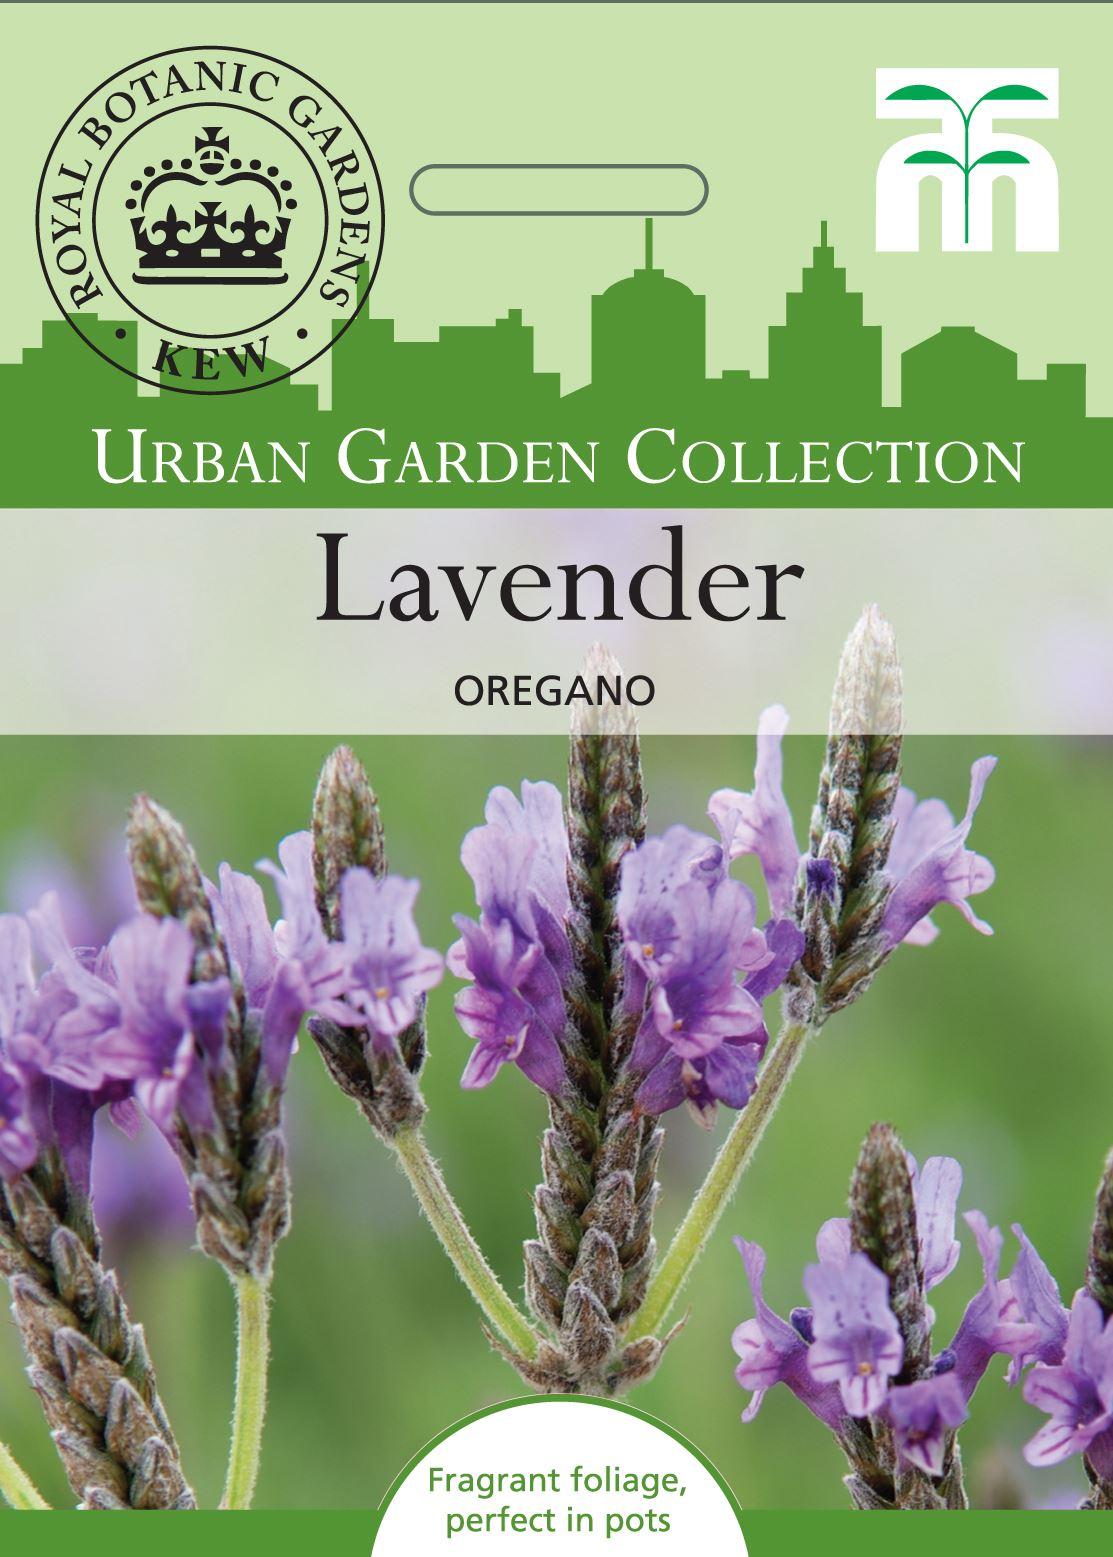 LAVANDULA ANGUSTIFOLIA alveolo Lavanda inglese 1 pianta English lavender